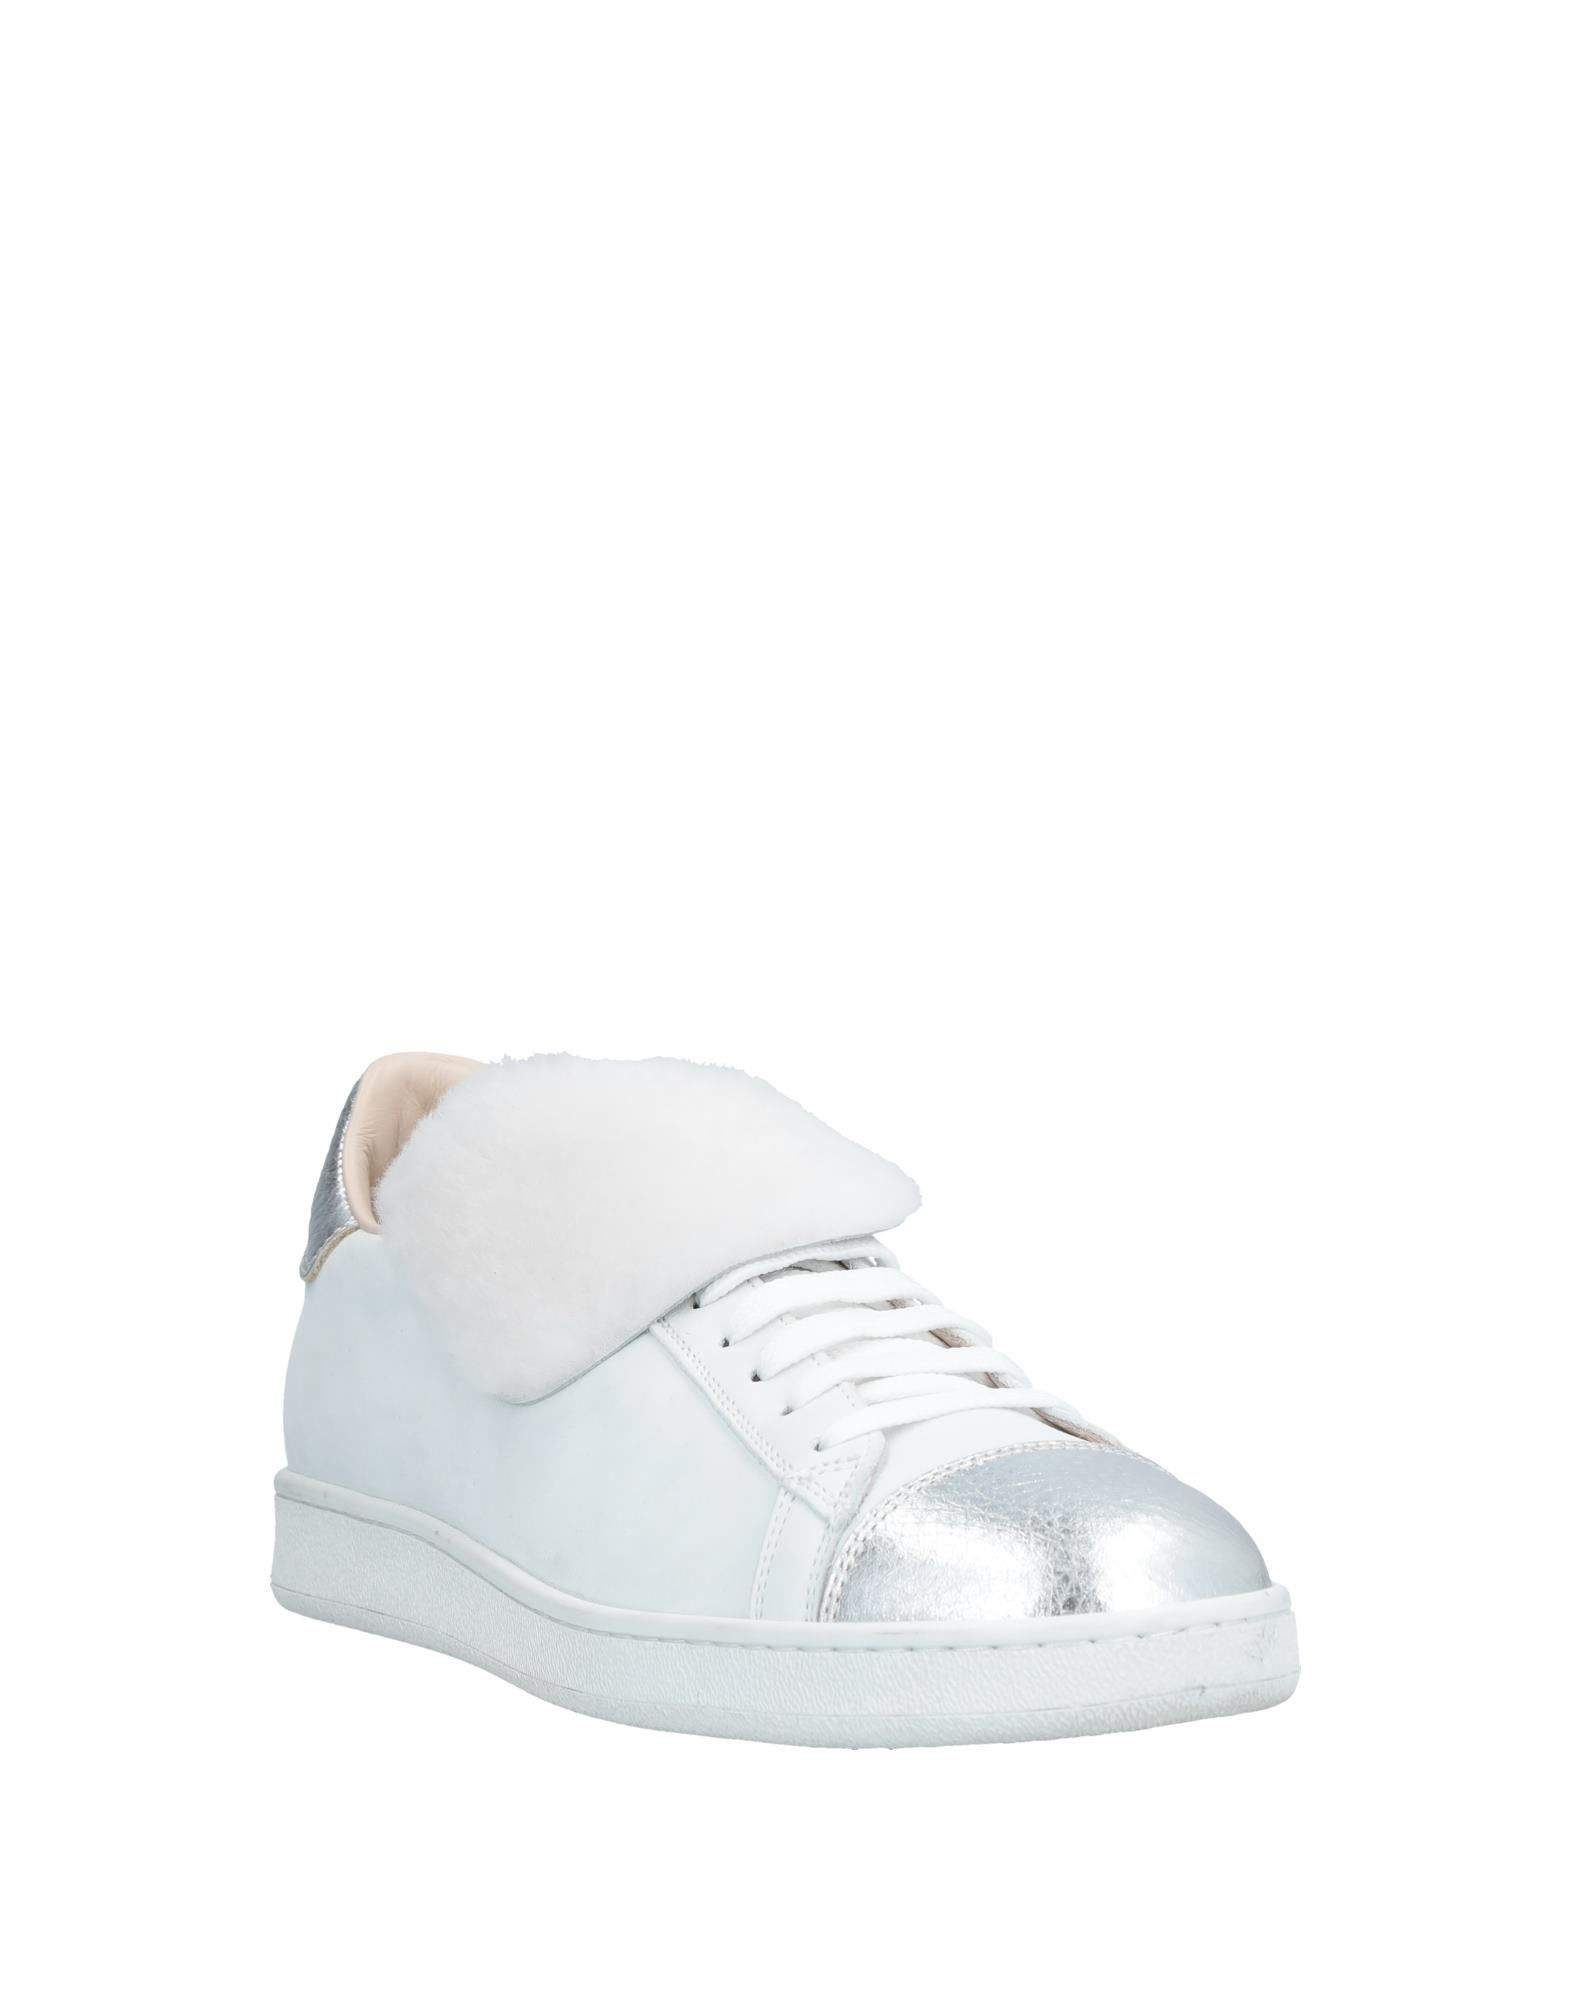 Fabiana Filippi Sneakers Schuhe Damen  11536018LW Beliebte Schuhe Sneakers b87180